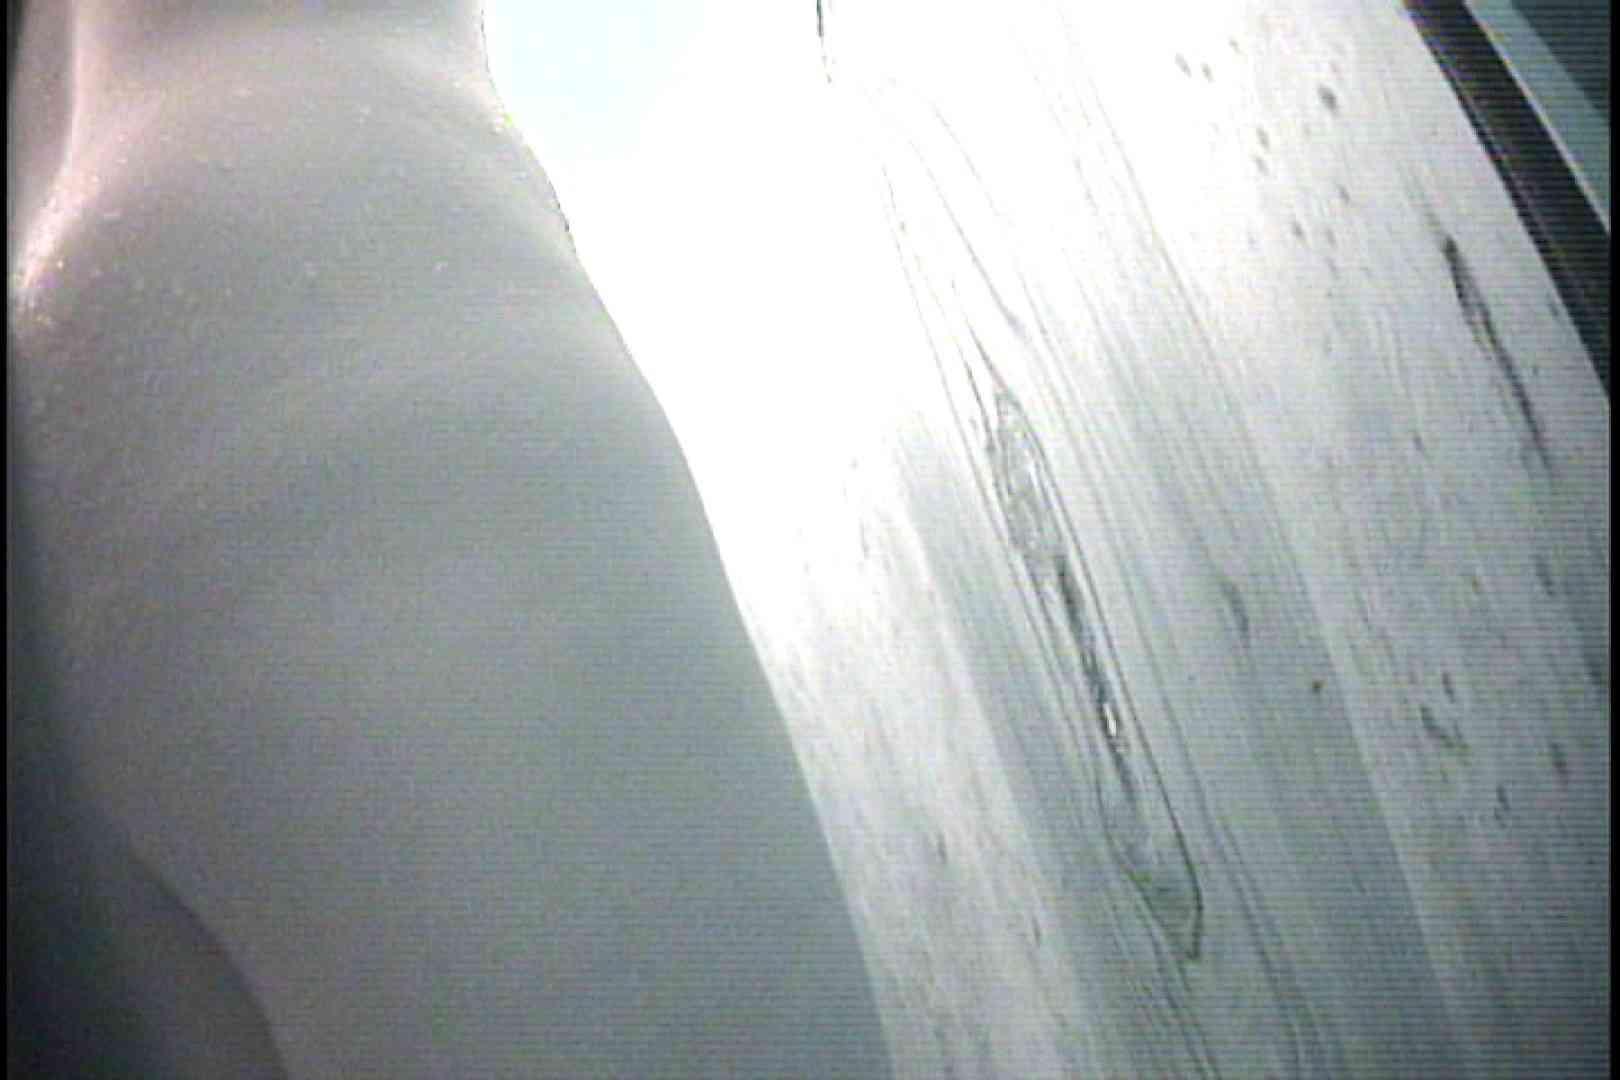 No.14 ヒモパンが似合うセクシーお女市さま 下半身 隠し撮りオマンコ動画紹介 101連発 63